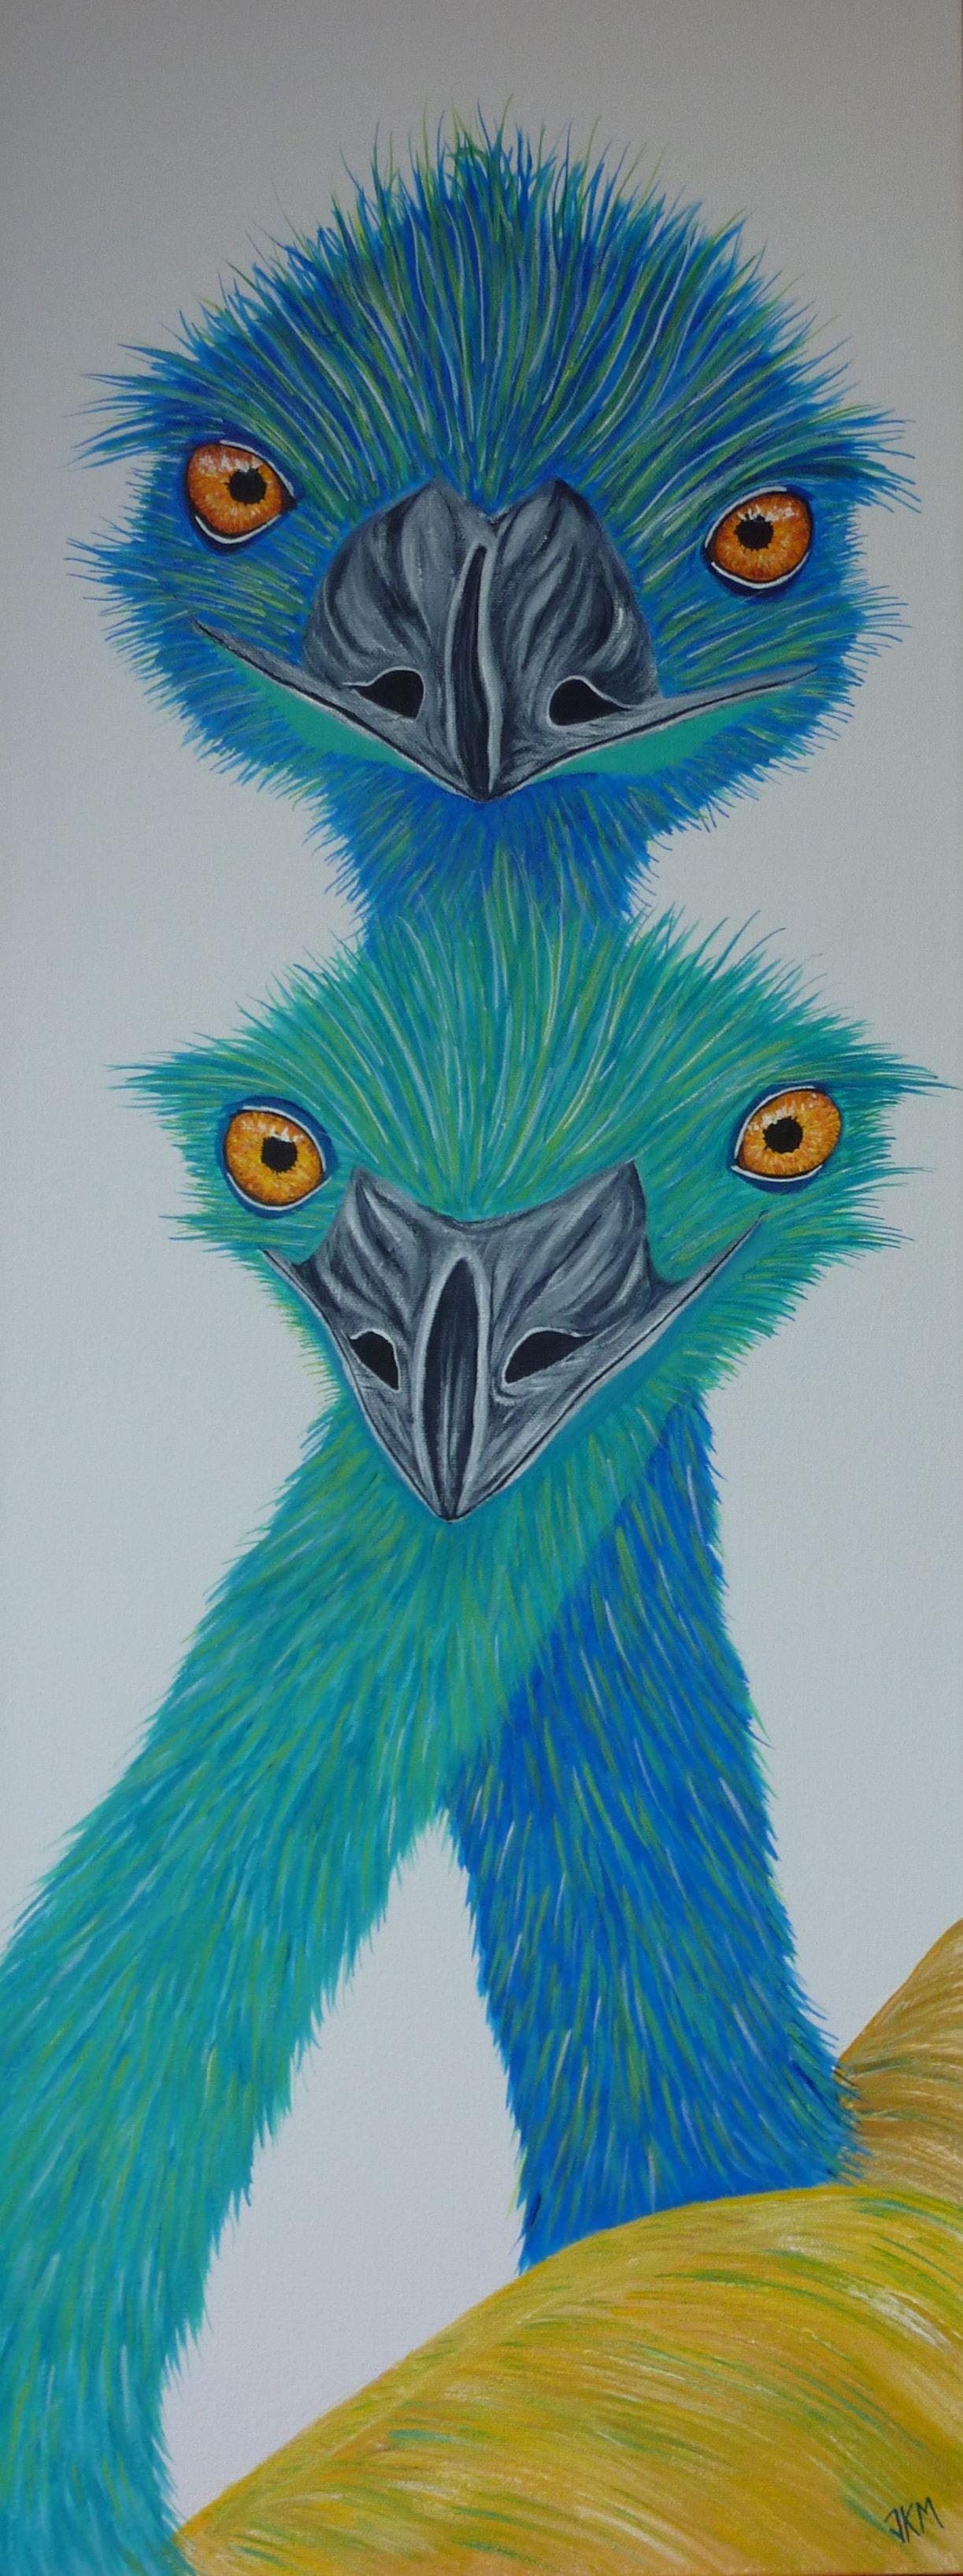 Emu Photo Bomb